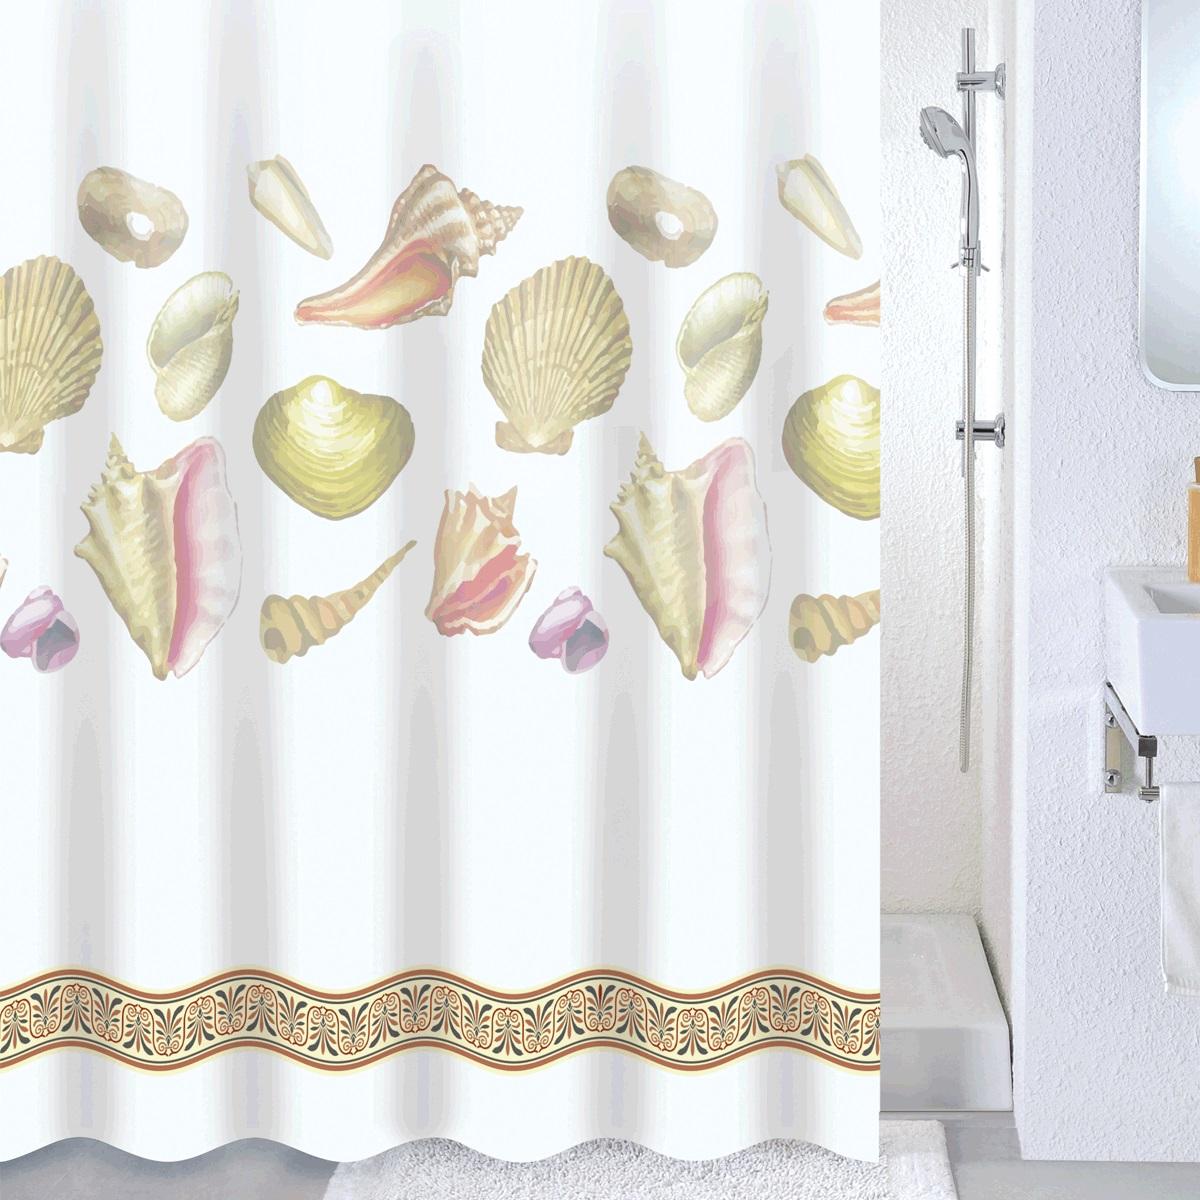 Штора для ванной Milardo Shelly beach, цвет: мультиколор, 180 x 180 см двойная штора для ванной